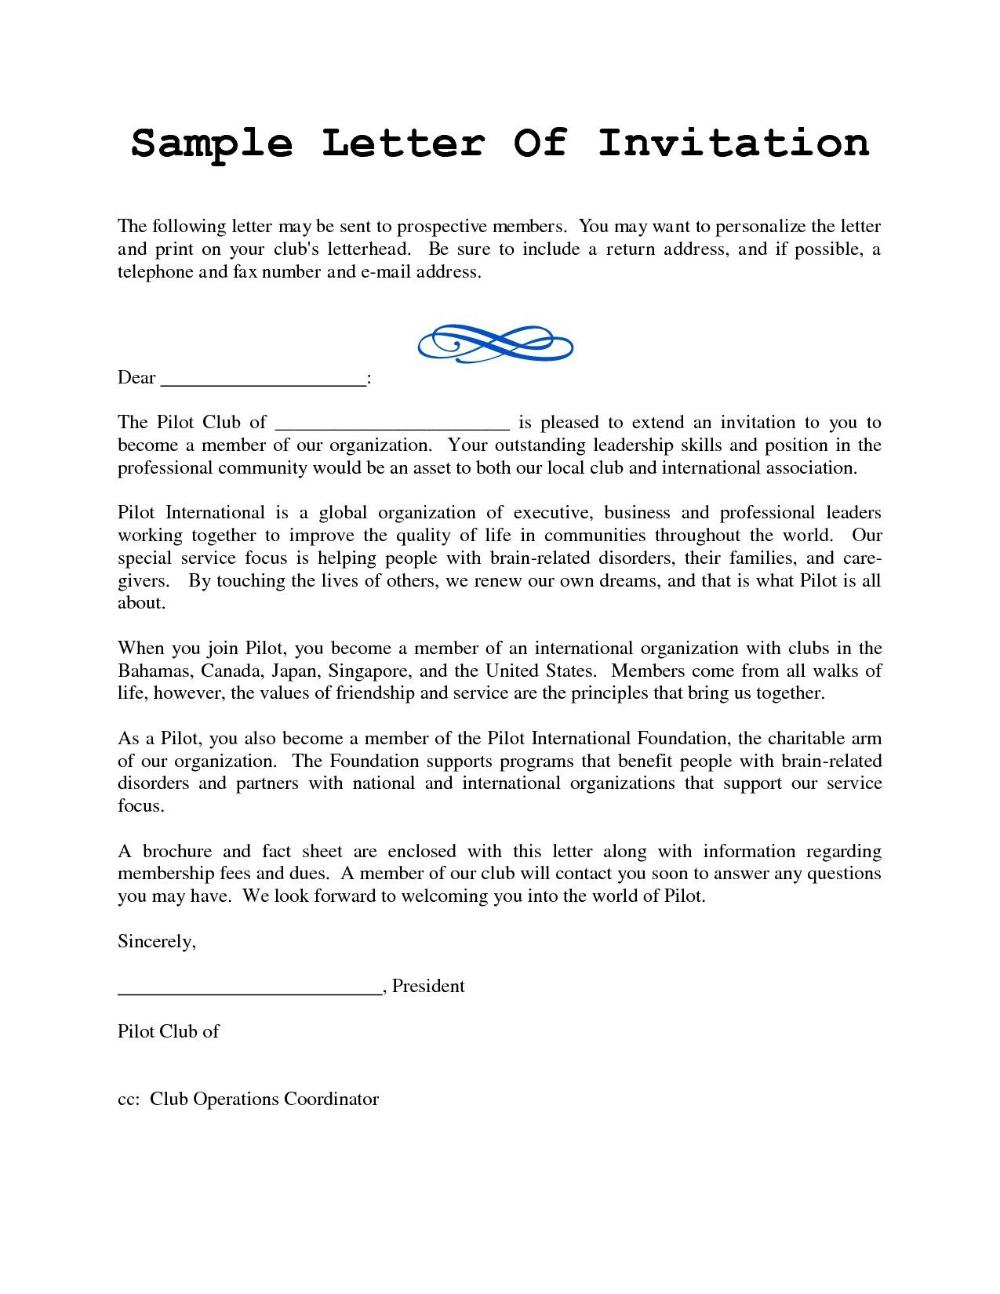 Sample Of Formal Invitation Letter For A Seminar